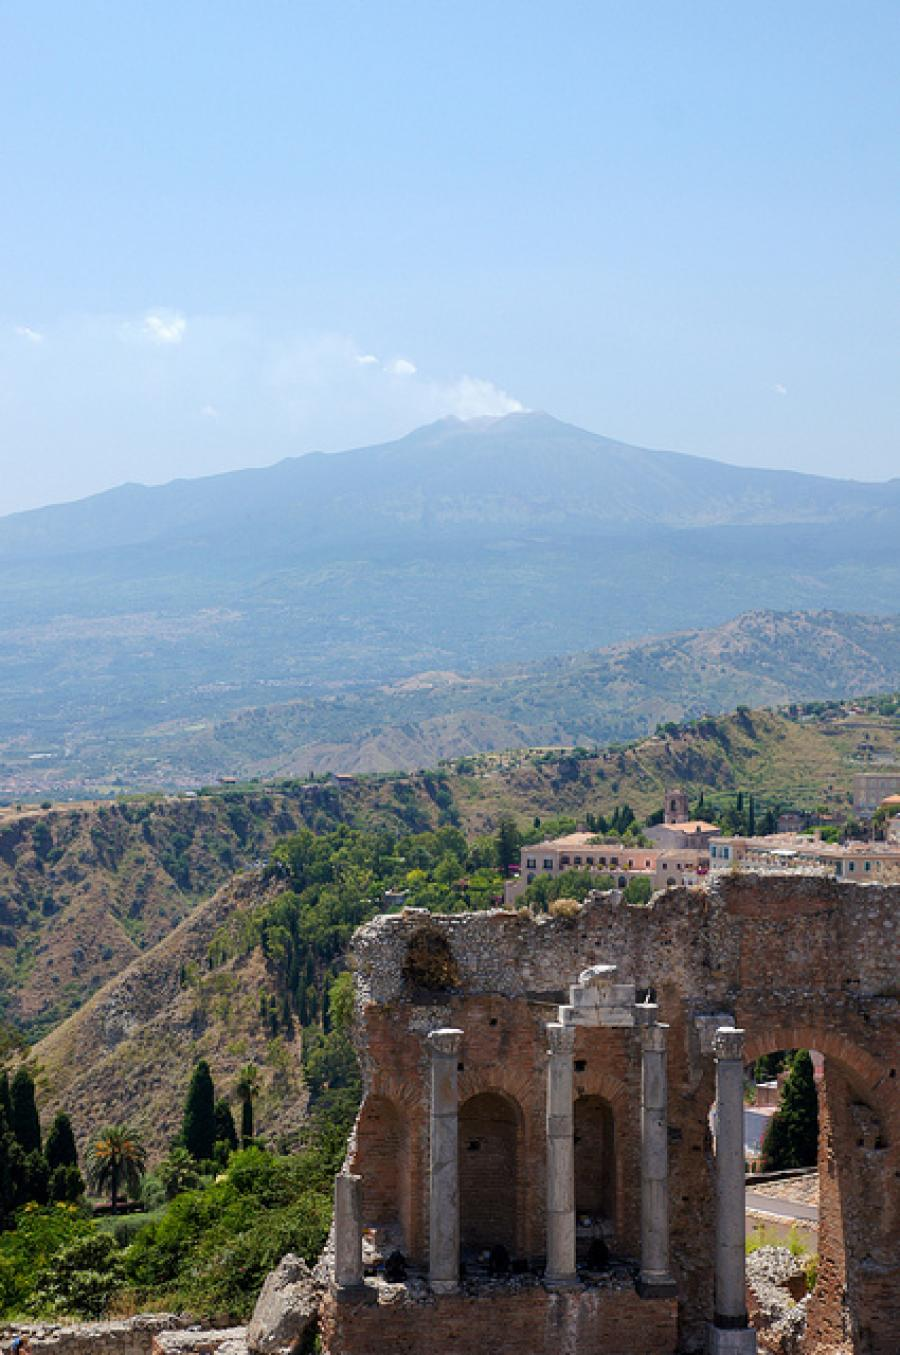 The Mole Diaries: Sicily